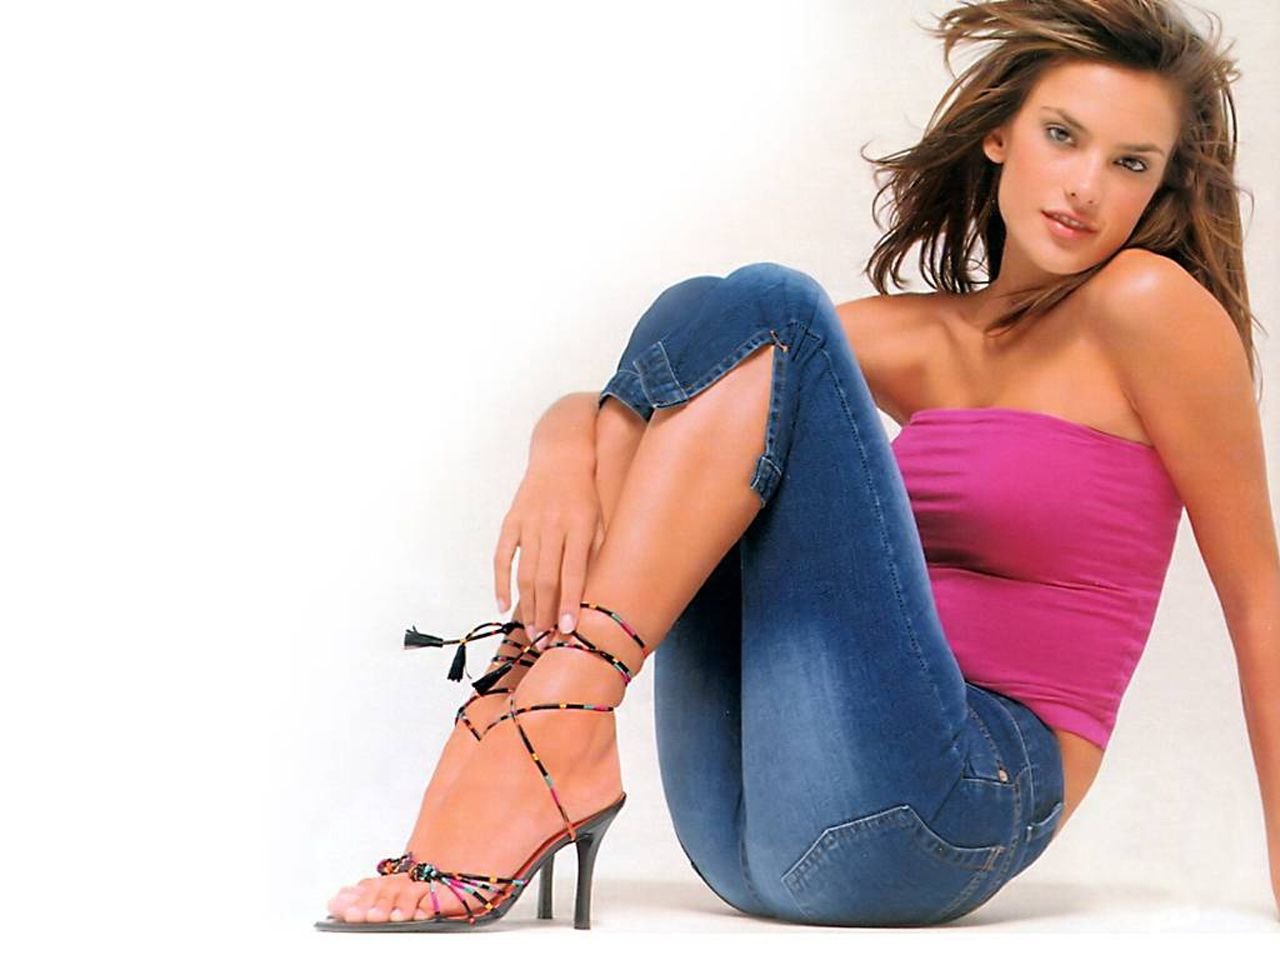 http://4.bp.blogspot.com/-c7q6WcMJoC0/T37ycgEEeSI/AAAAAAAAFmY/k9ENt34IHzY/s1600/Alessandra-Ambrosio-1.jpg